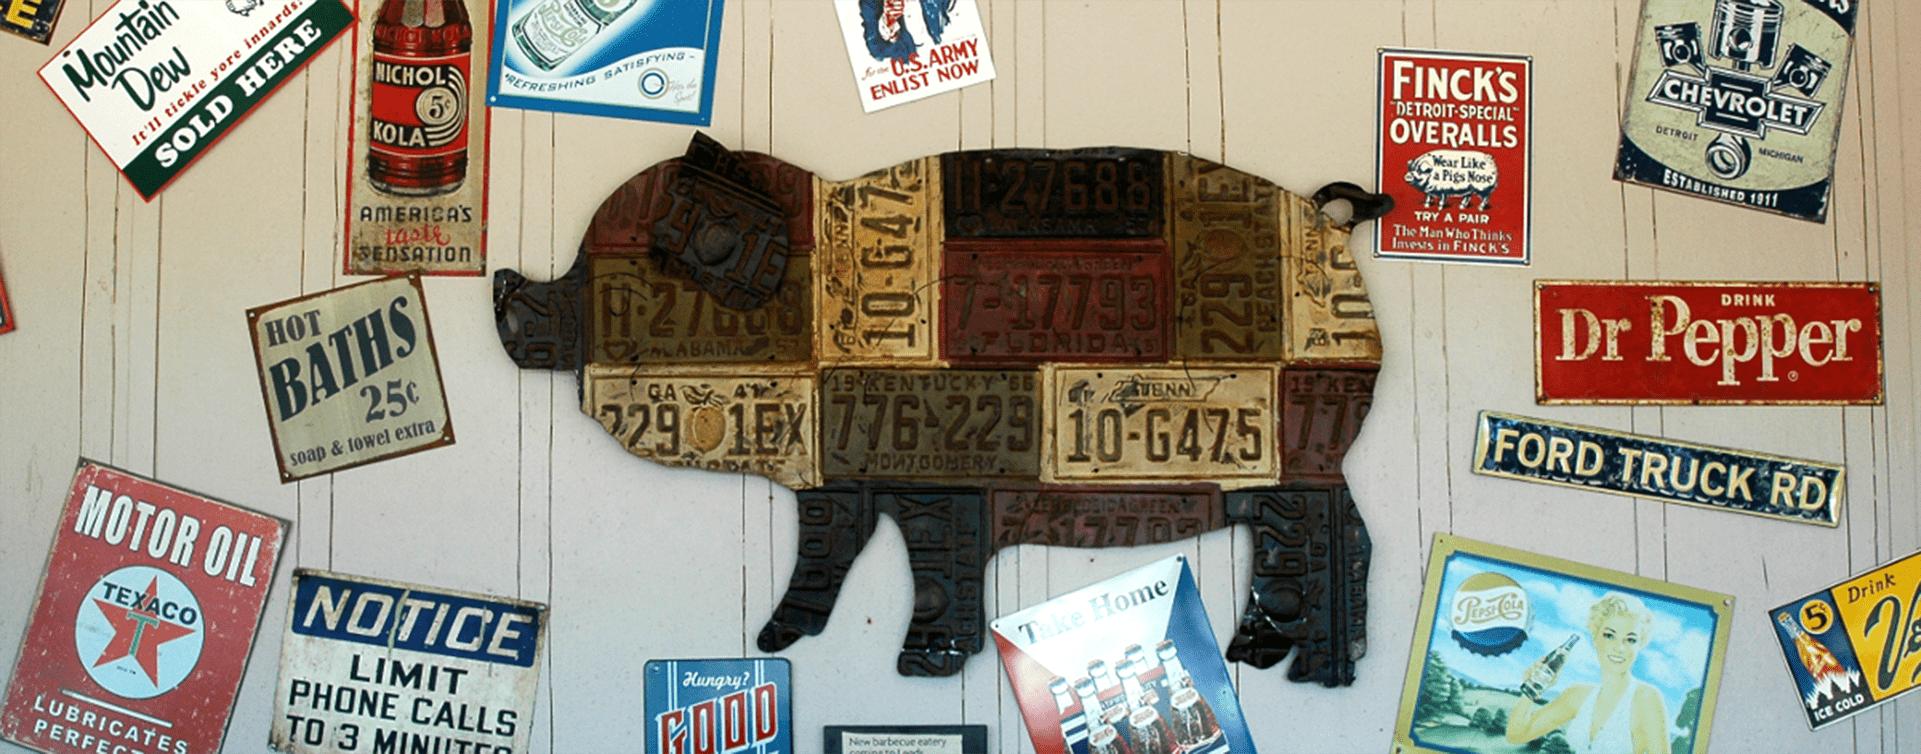 rustys bbq_pig_license_plates